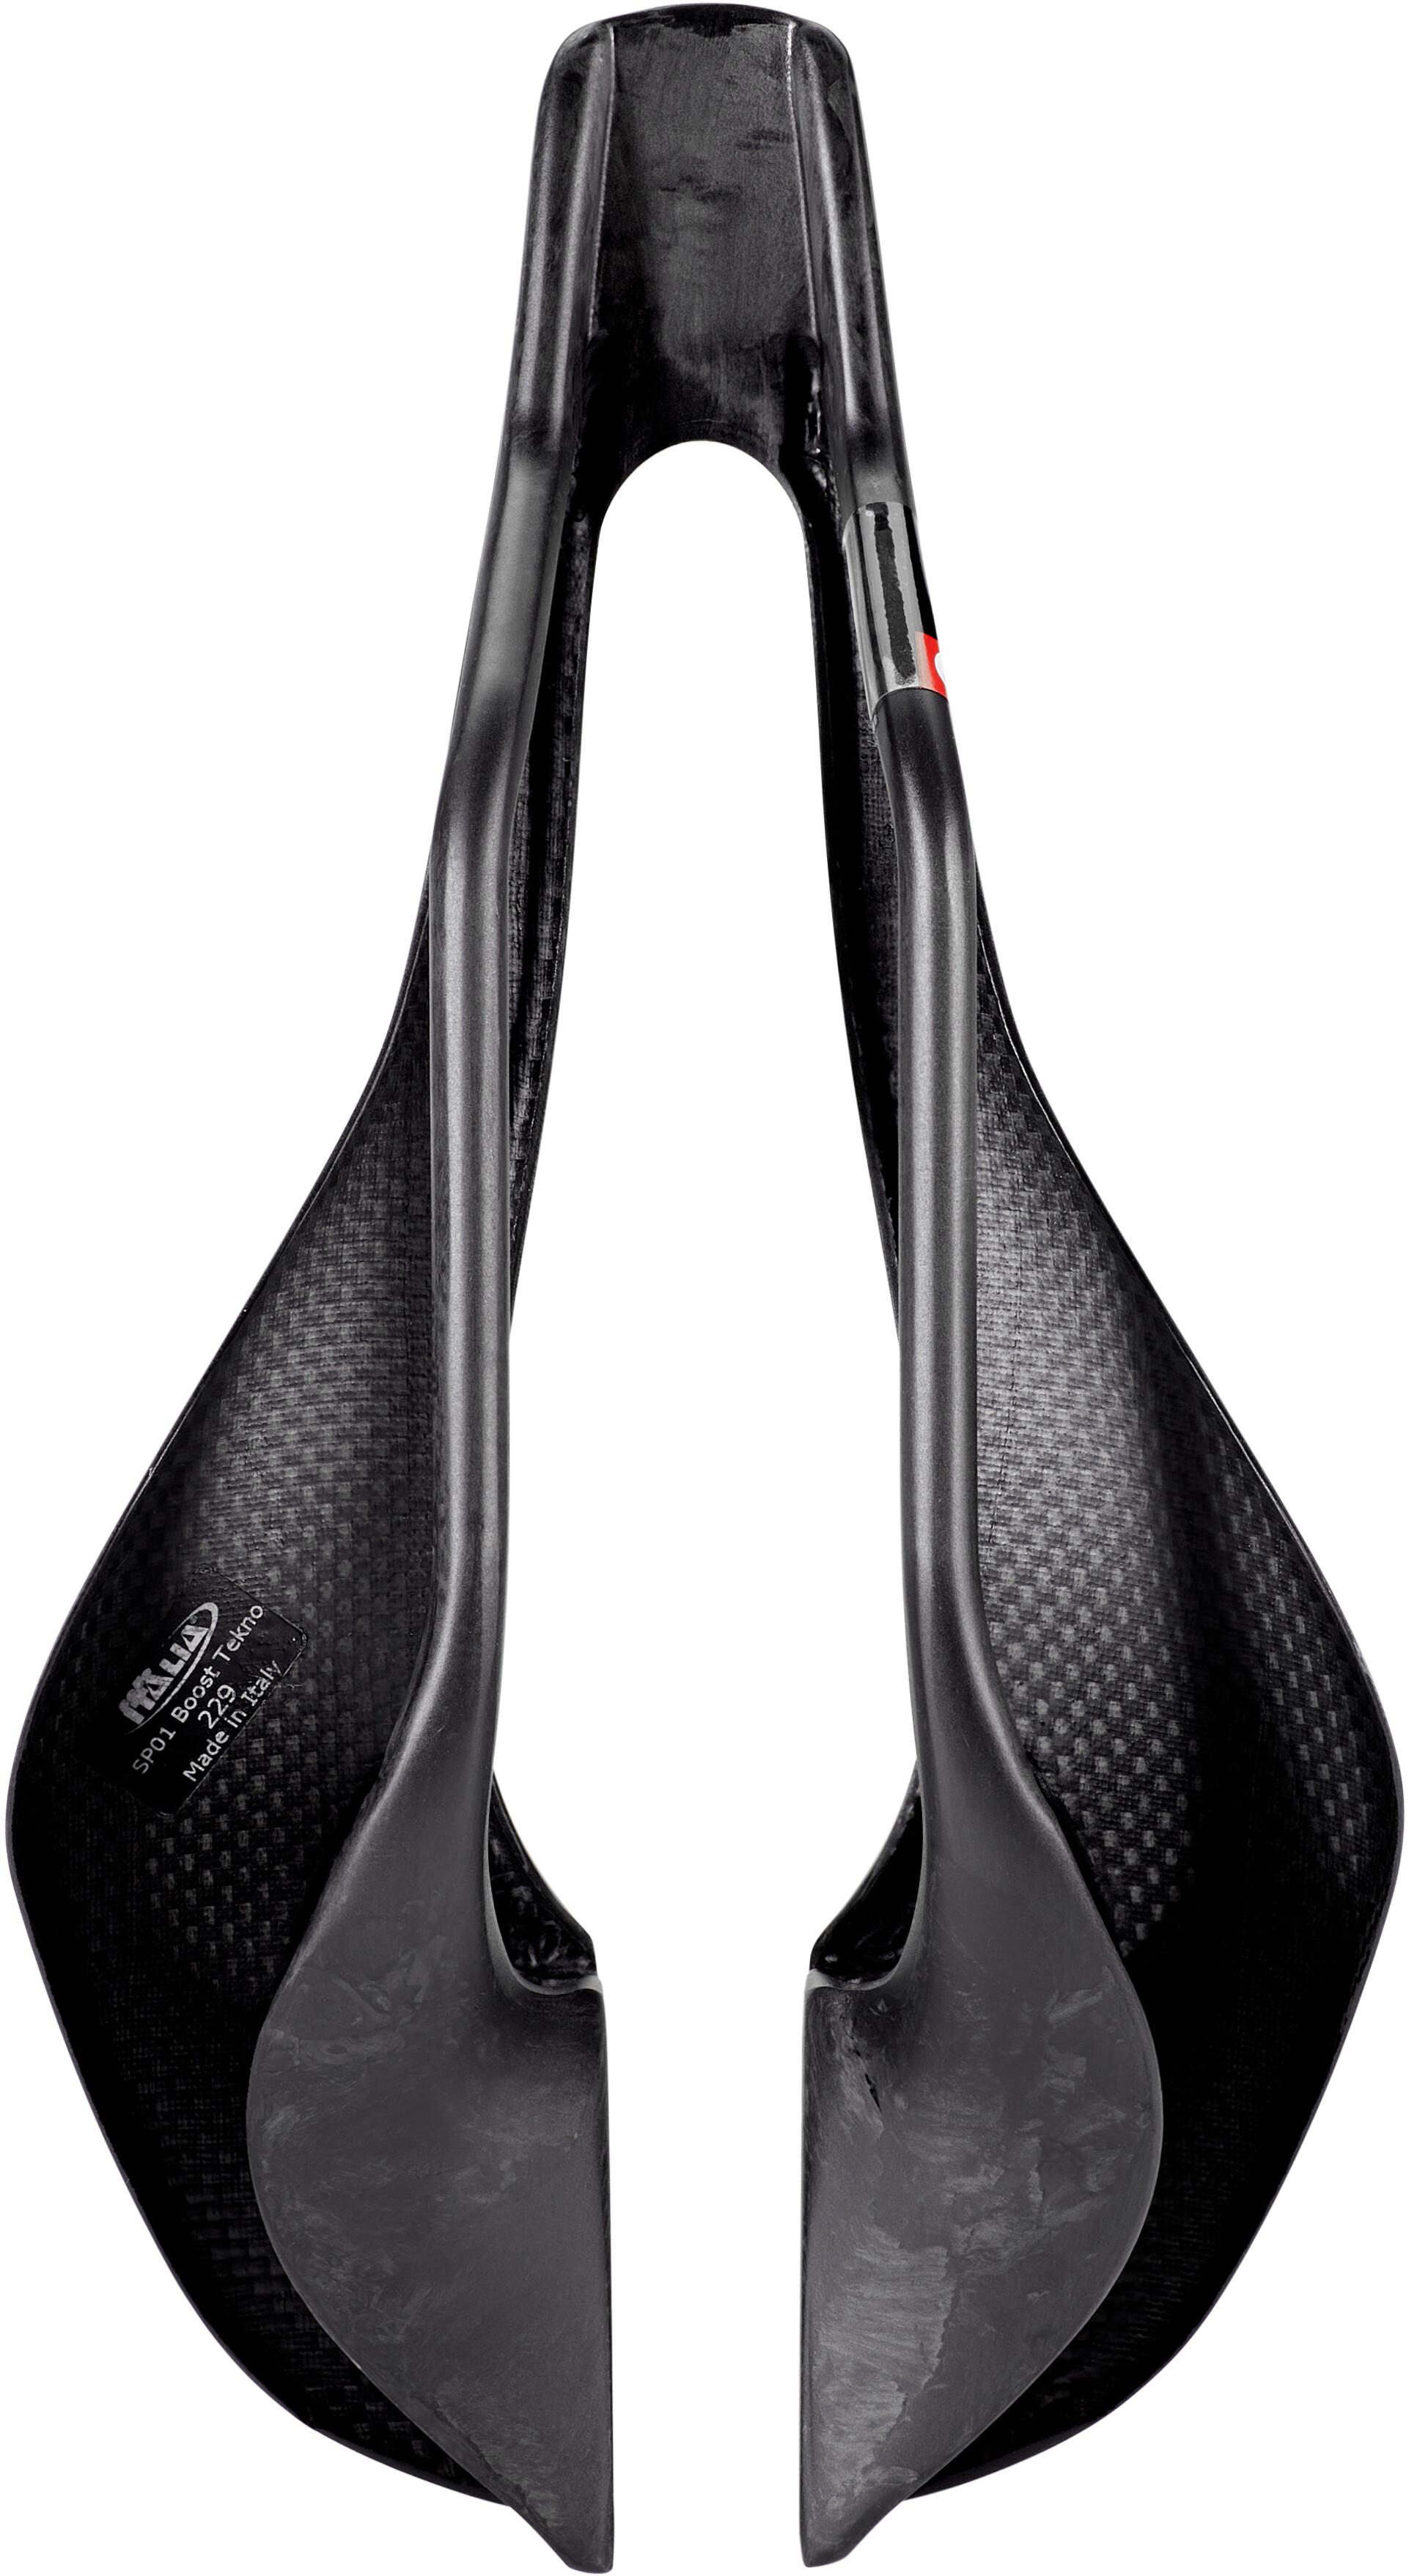 Selle Italia SP-01 Tekno Superflow Road Saddle | Merlin Cycles